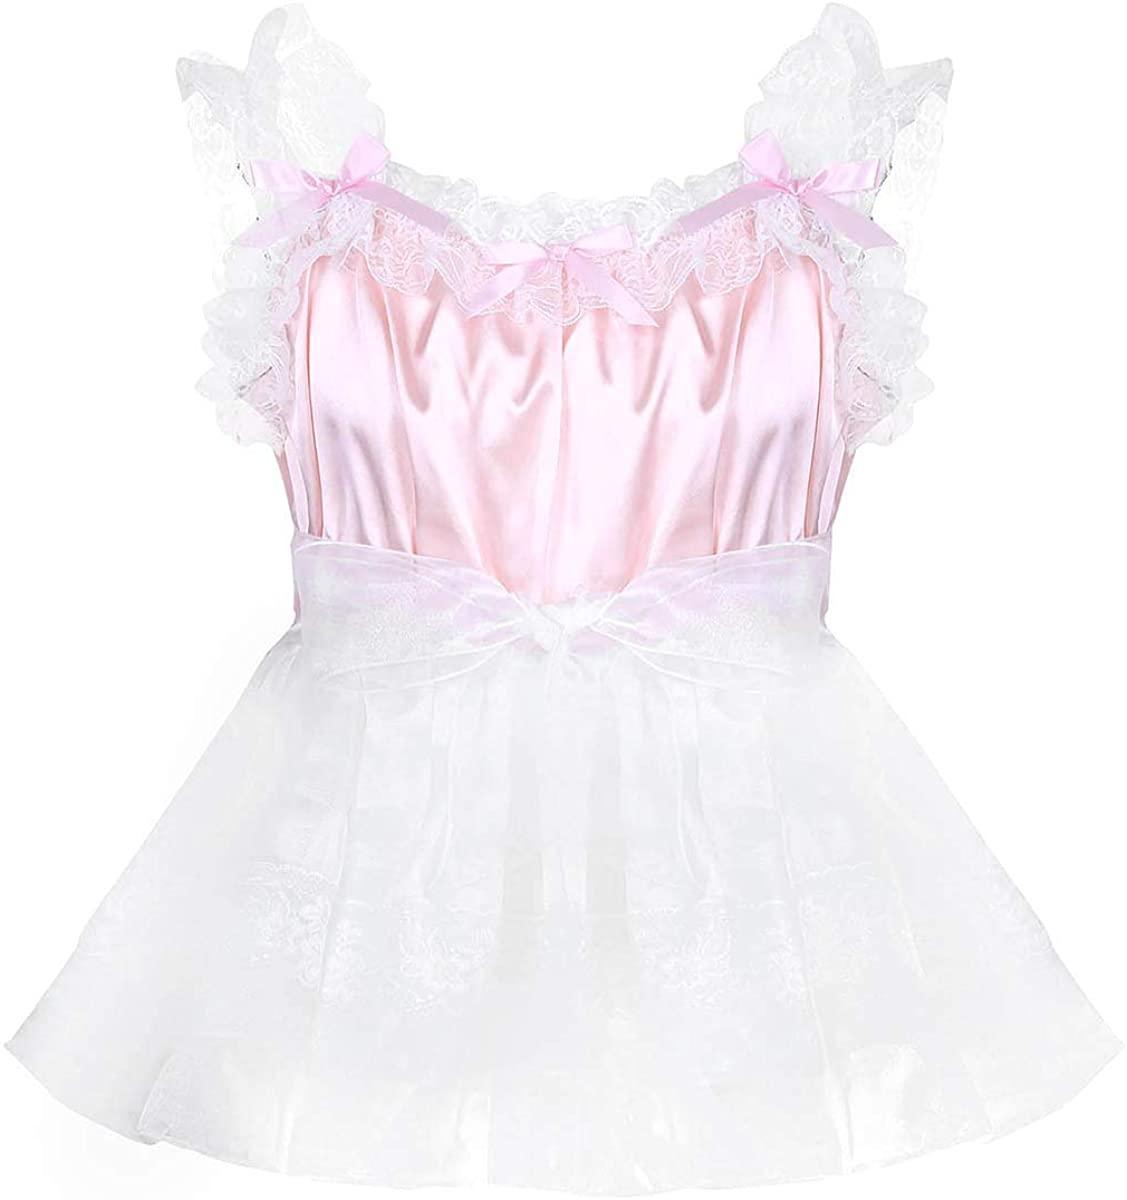 renvena Mens Adult Sissy Crossdressing Lingerie Satin Frilly Baby Doll Slip Dresses Nightwear Pajamas